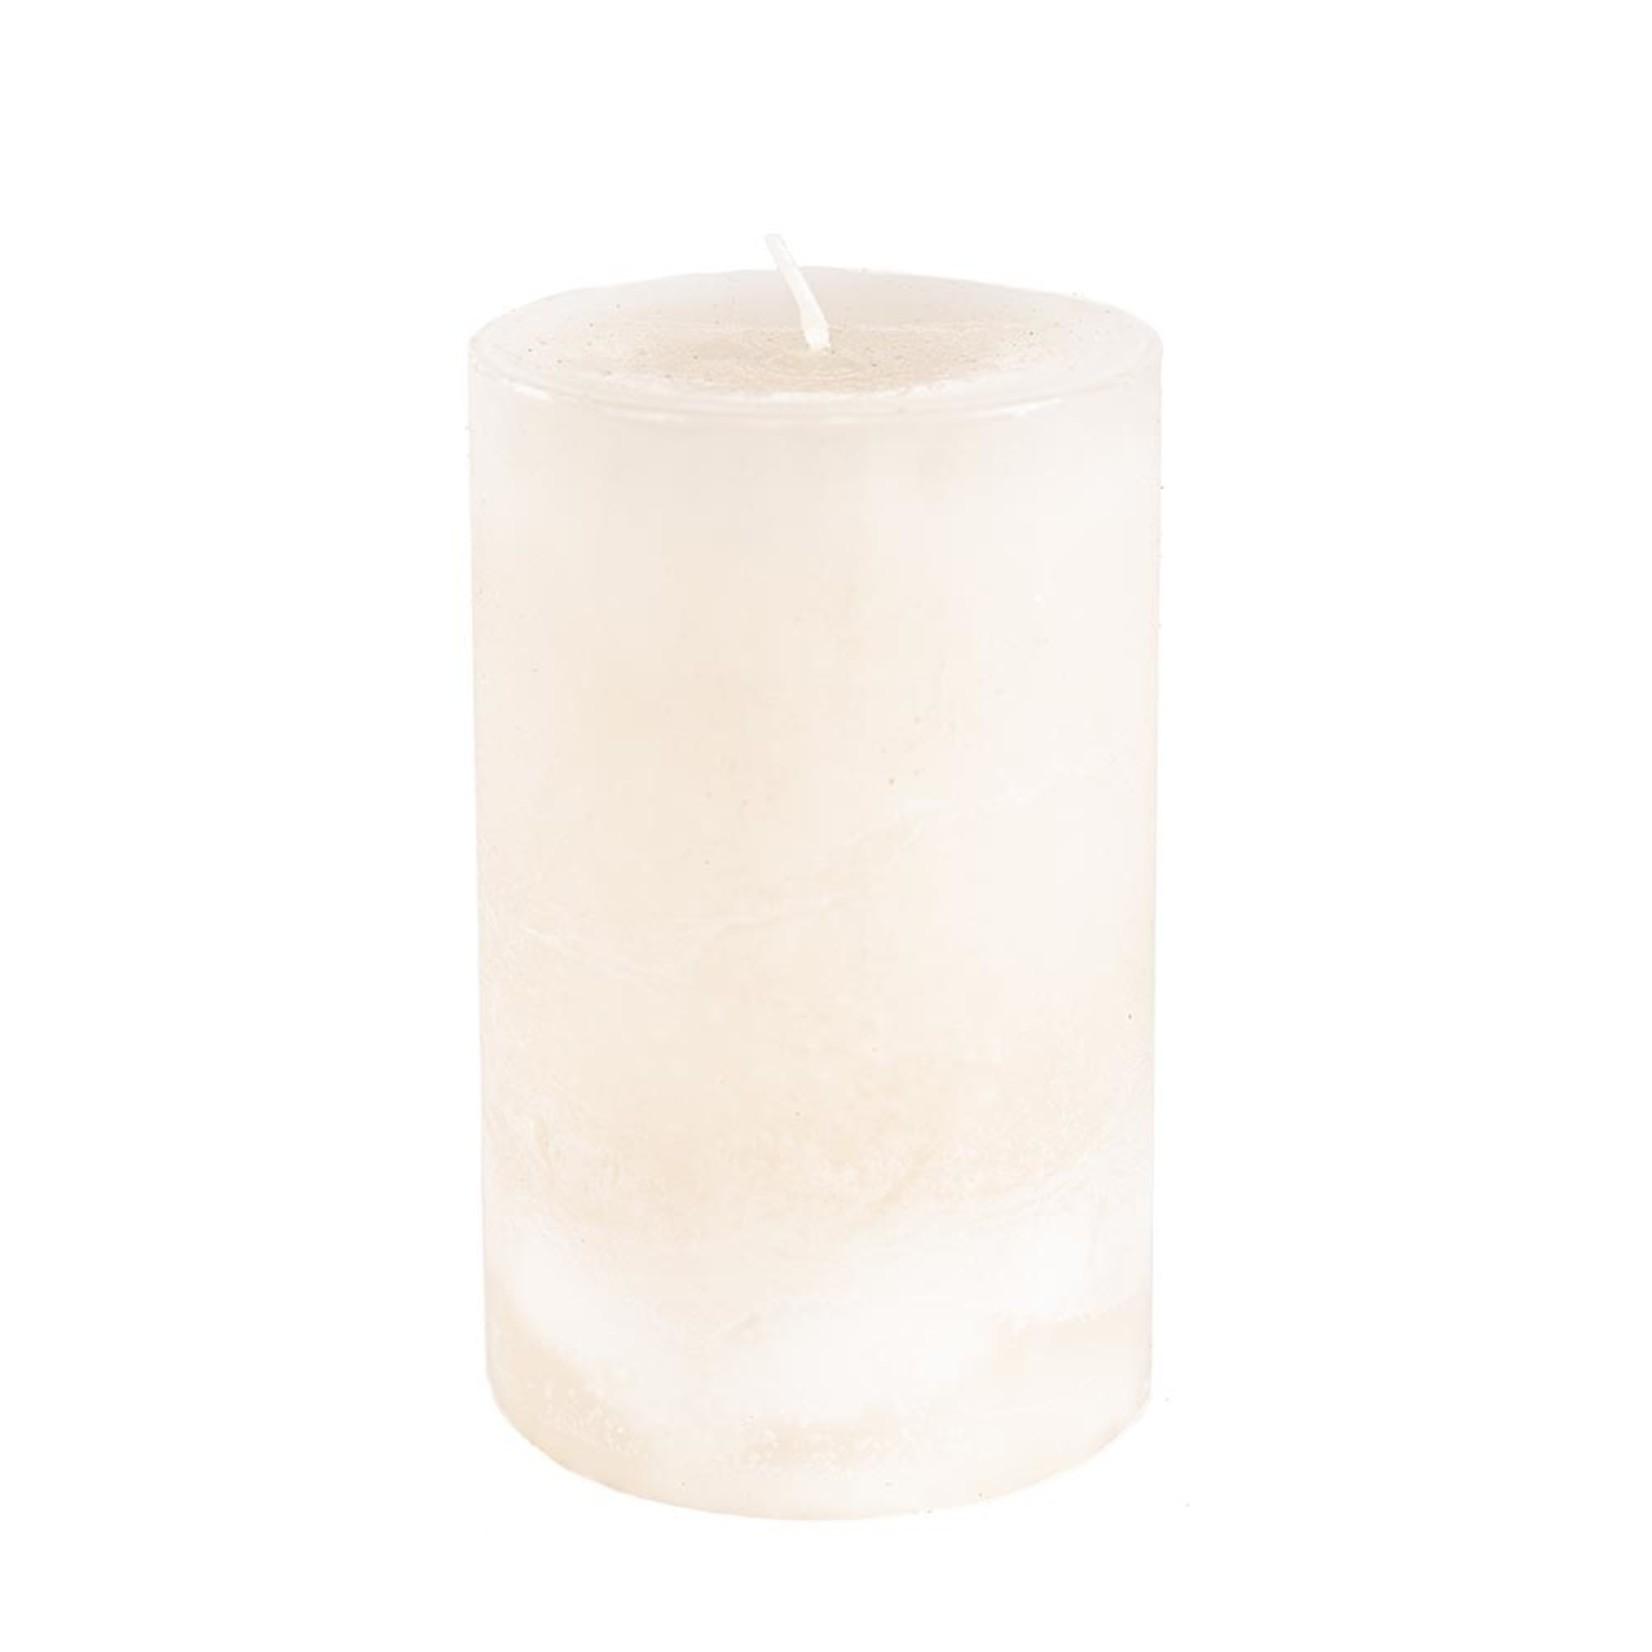 Home Society Pillar Candle 9x15cm Crerme